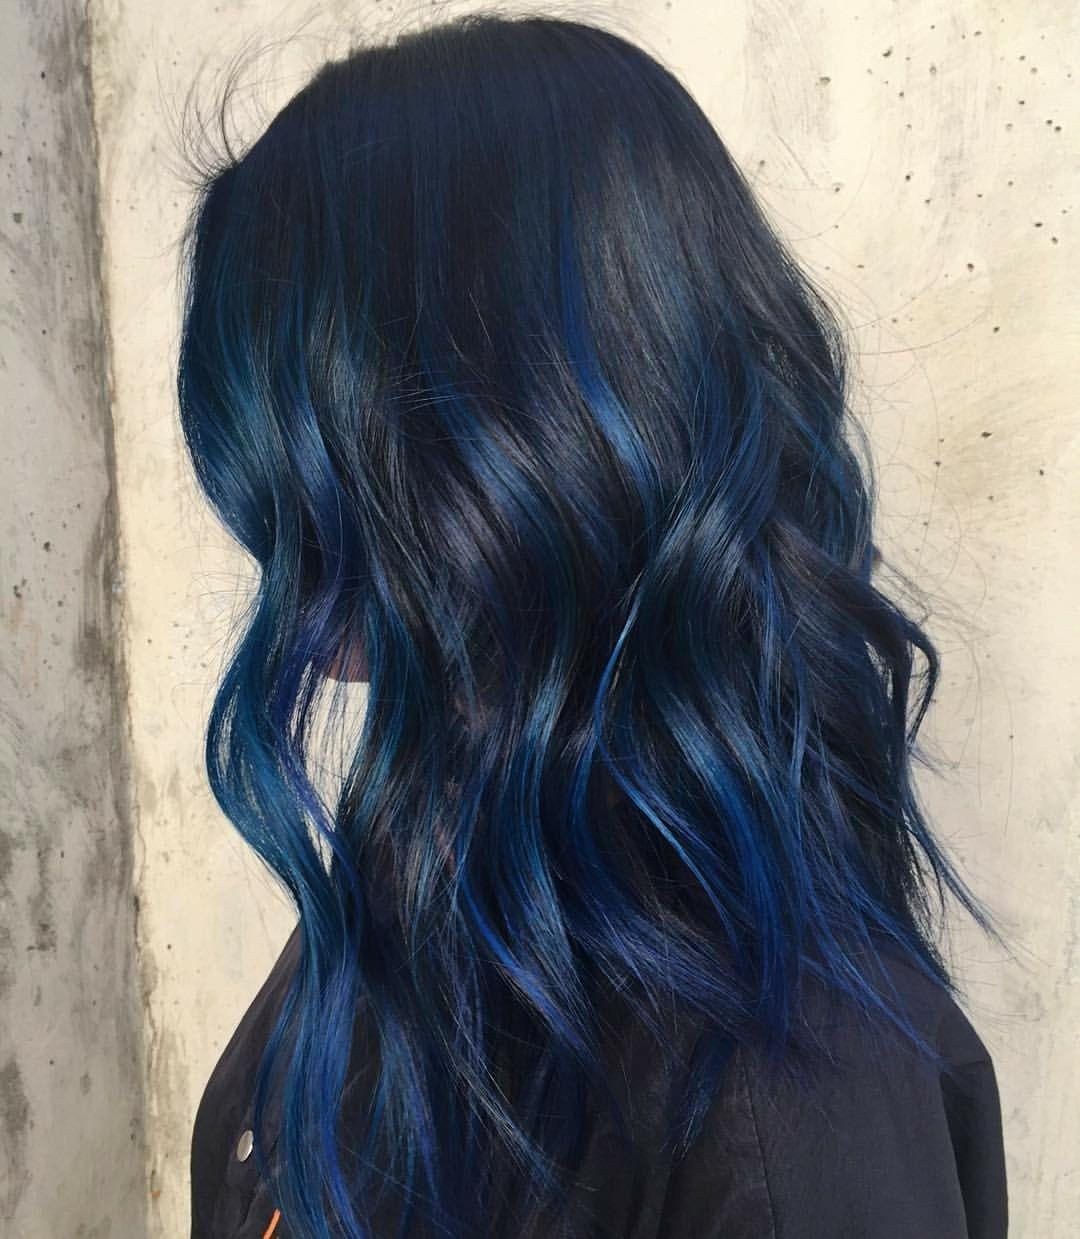 1 07 Pm Jettelag Ig Idfcemely Hair Styles Blue Black Hair Dark Blue Hair